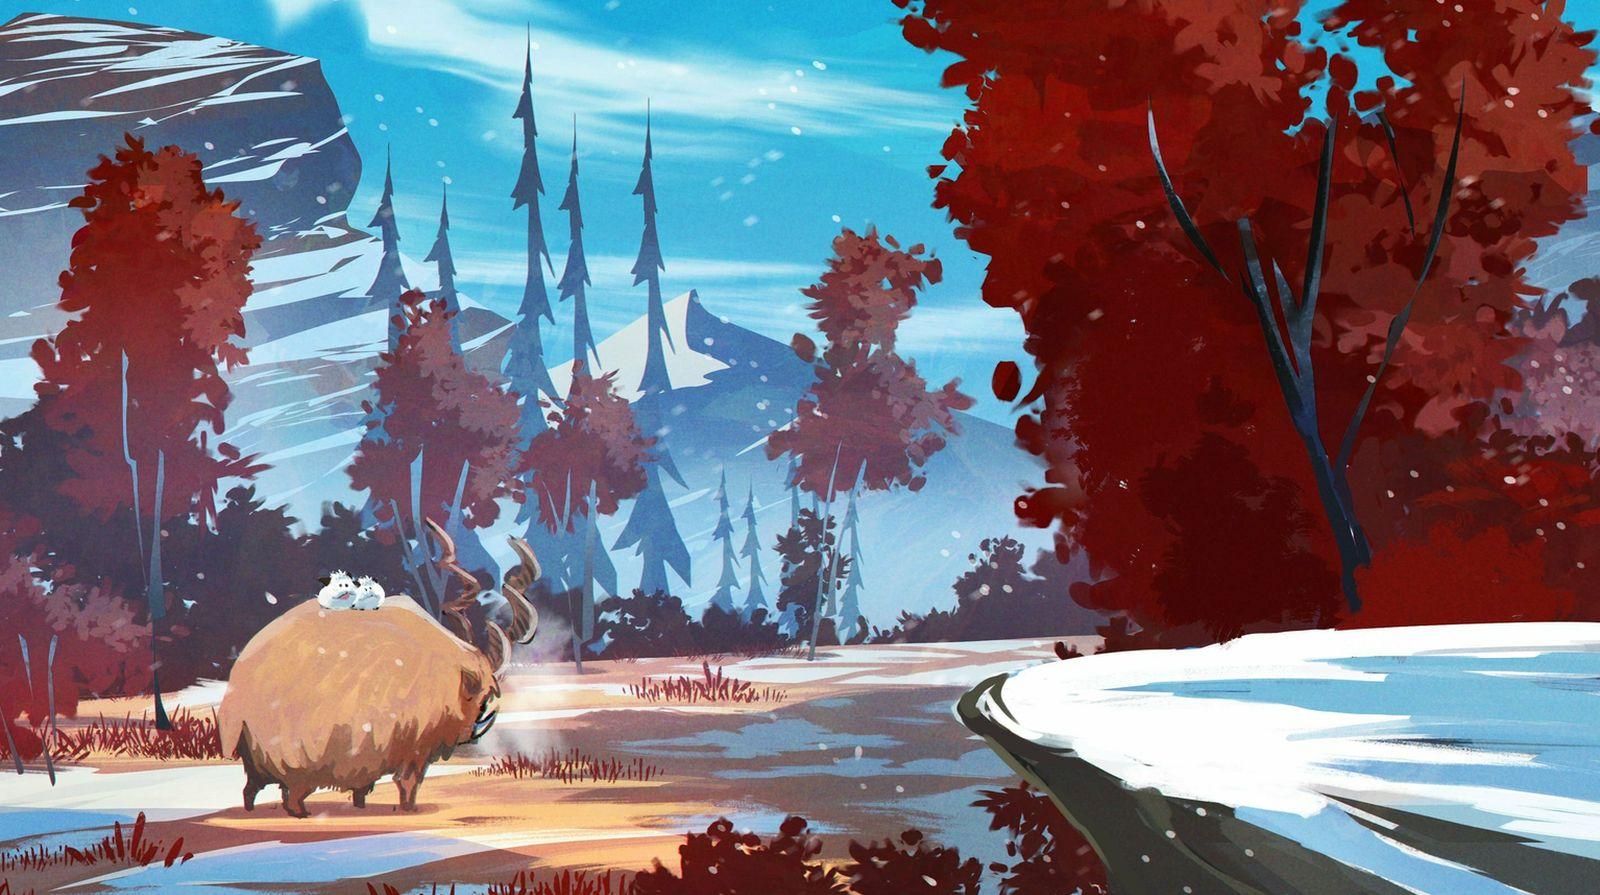 Riot Games займется выпуском игр по League of Legends